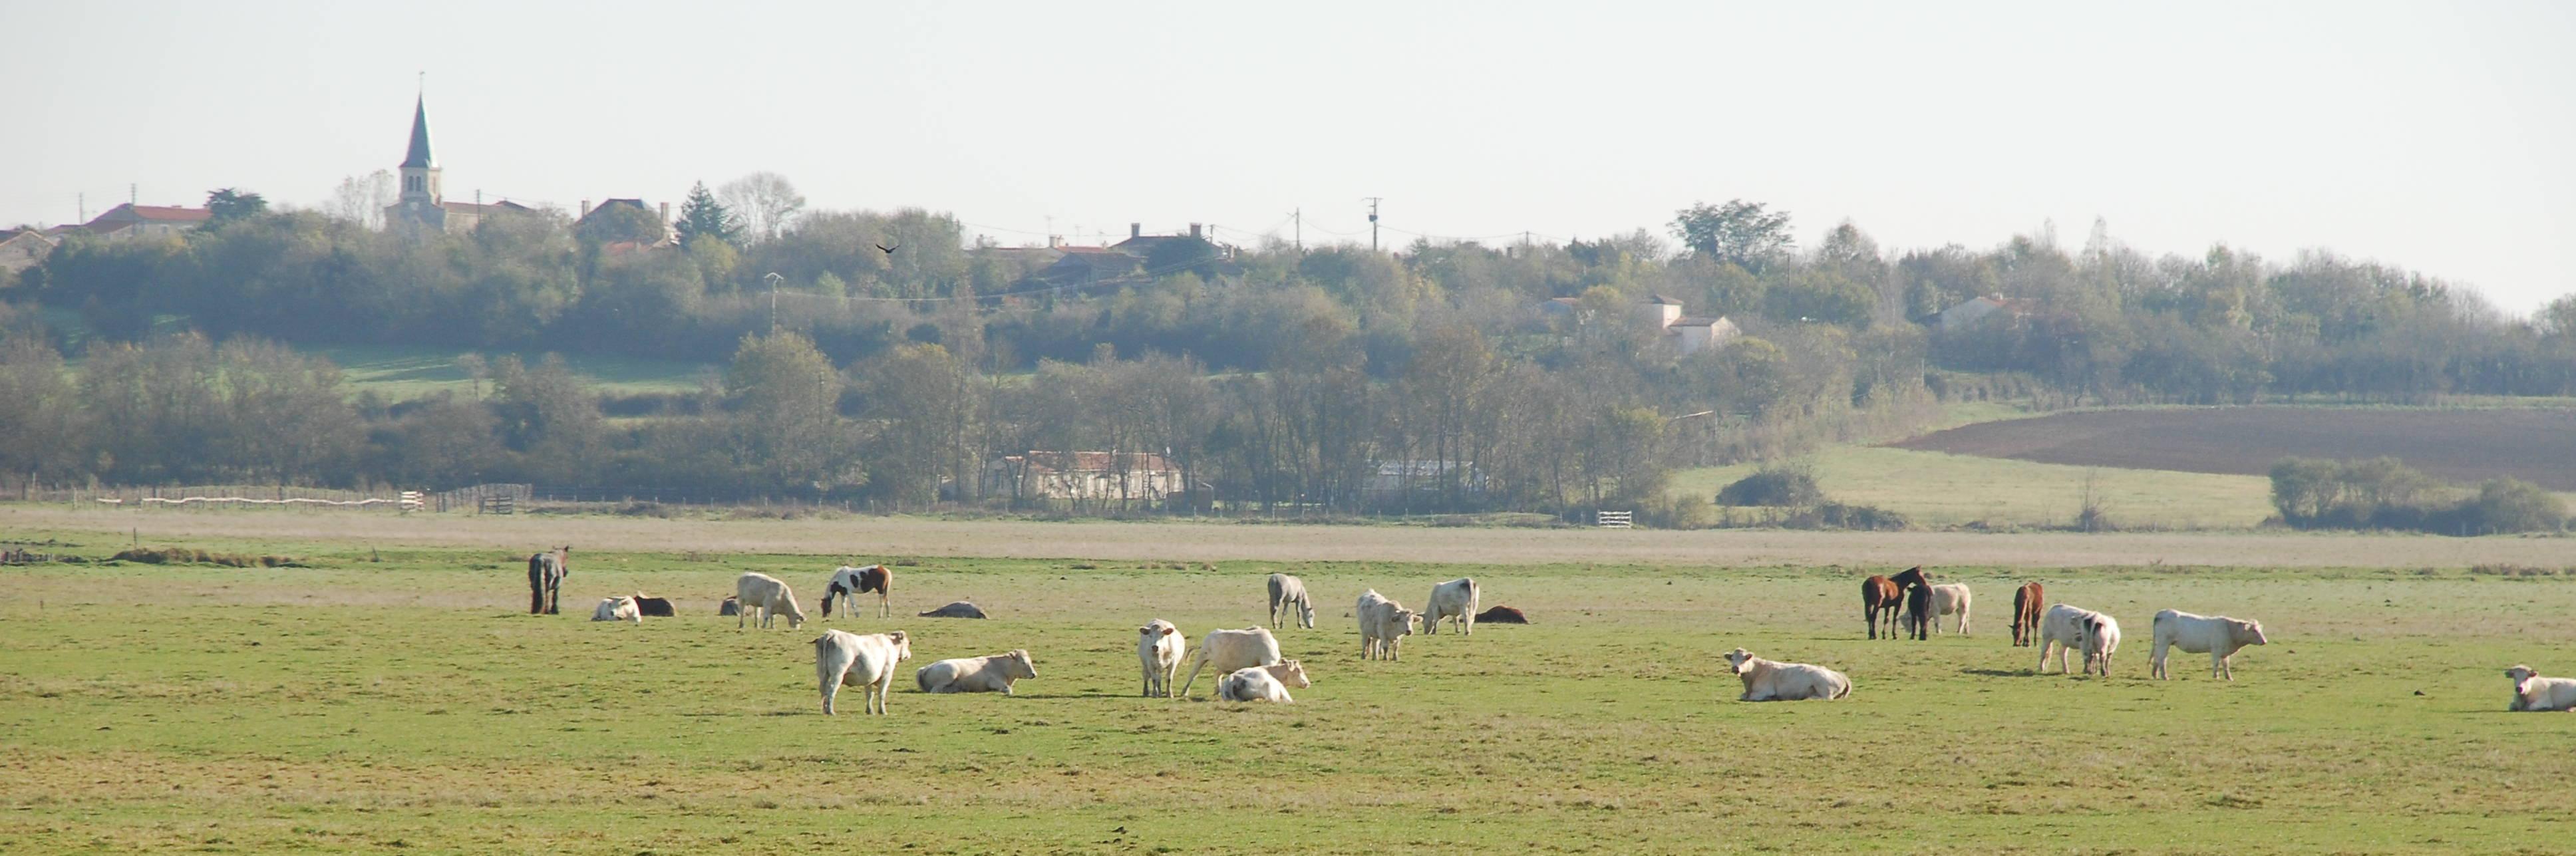 "The brand ""Valeurs Parc Naturel Régional"" for beef meat in the Marais poitevin"